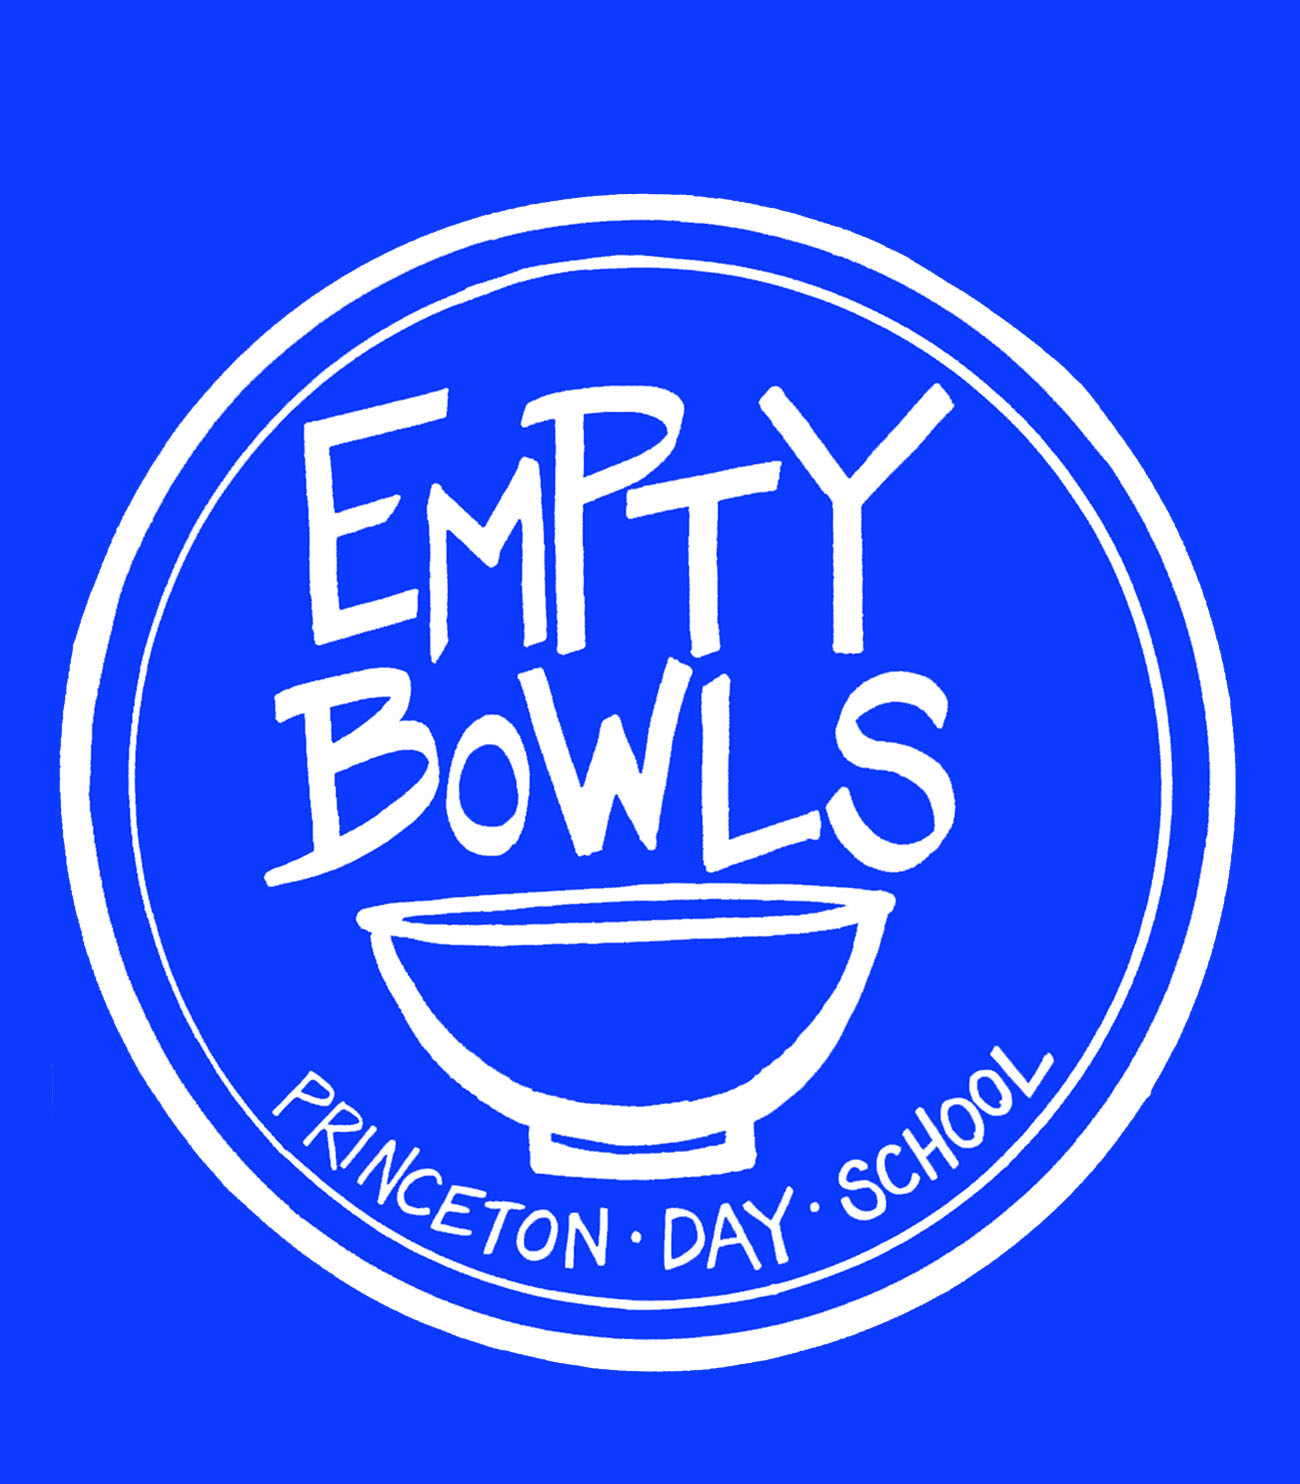 Empty Bowls Princeton Day School